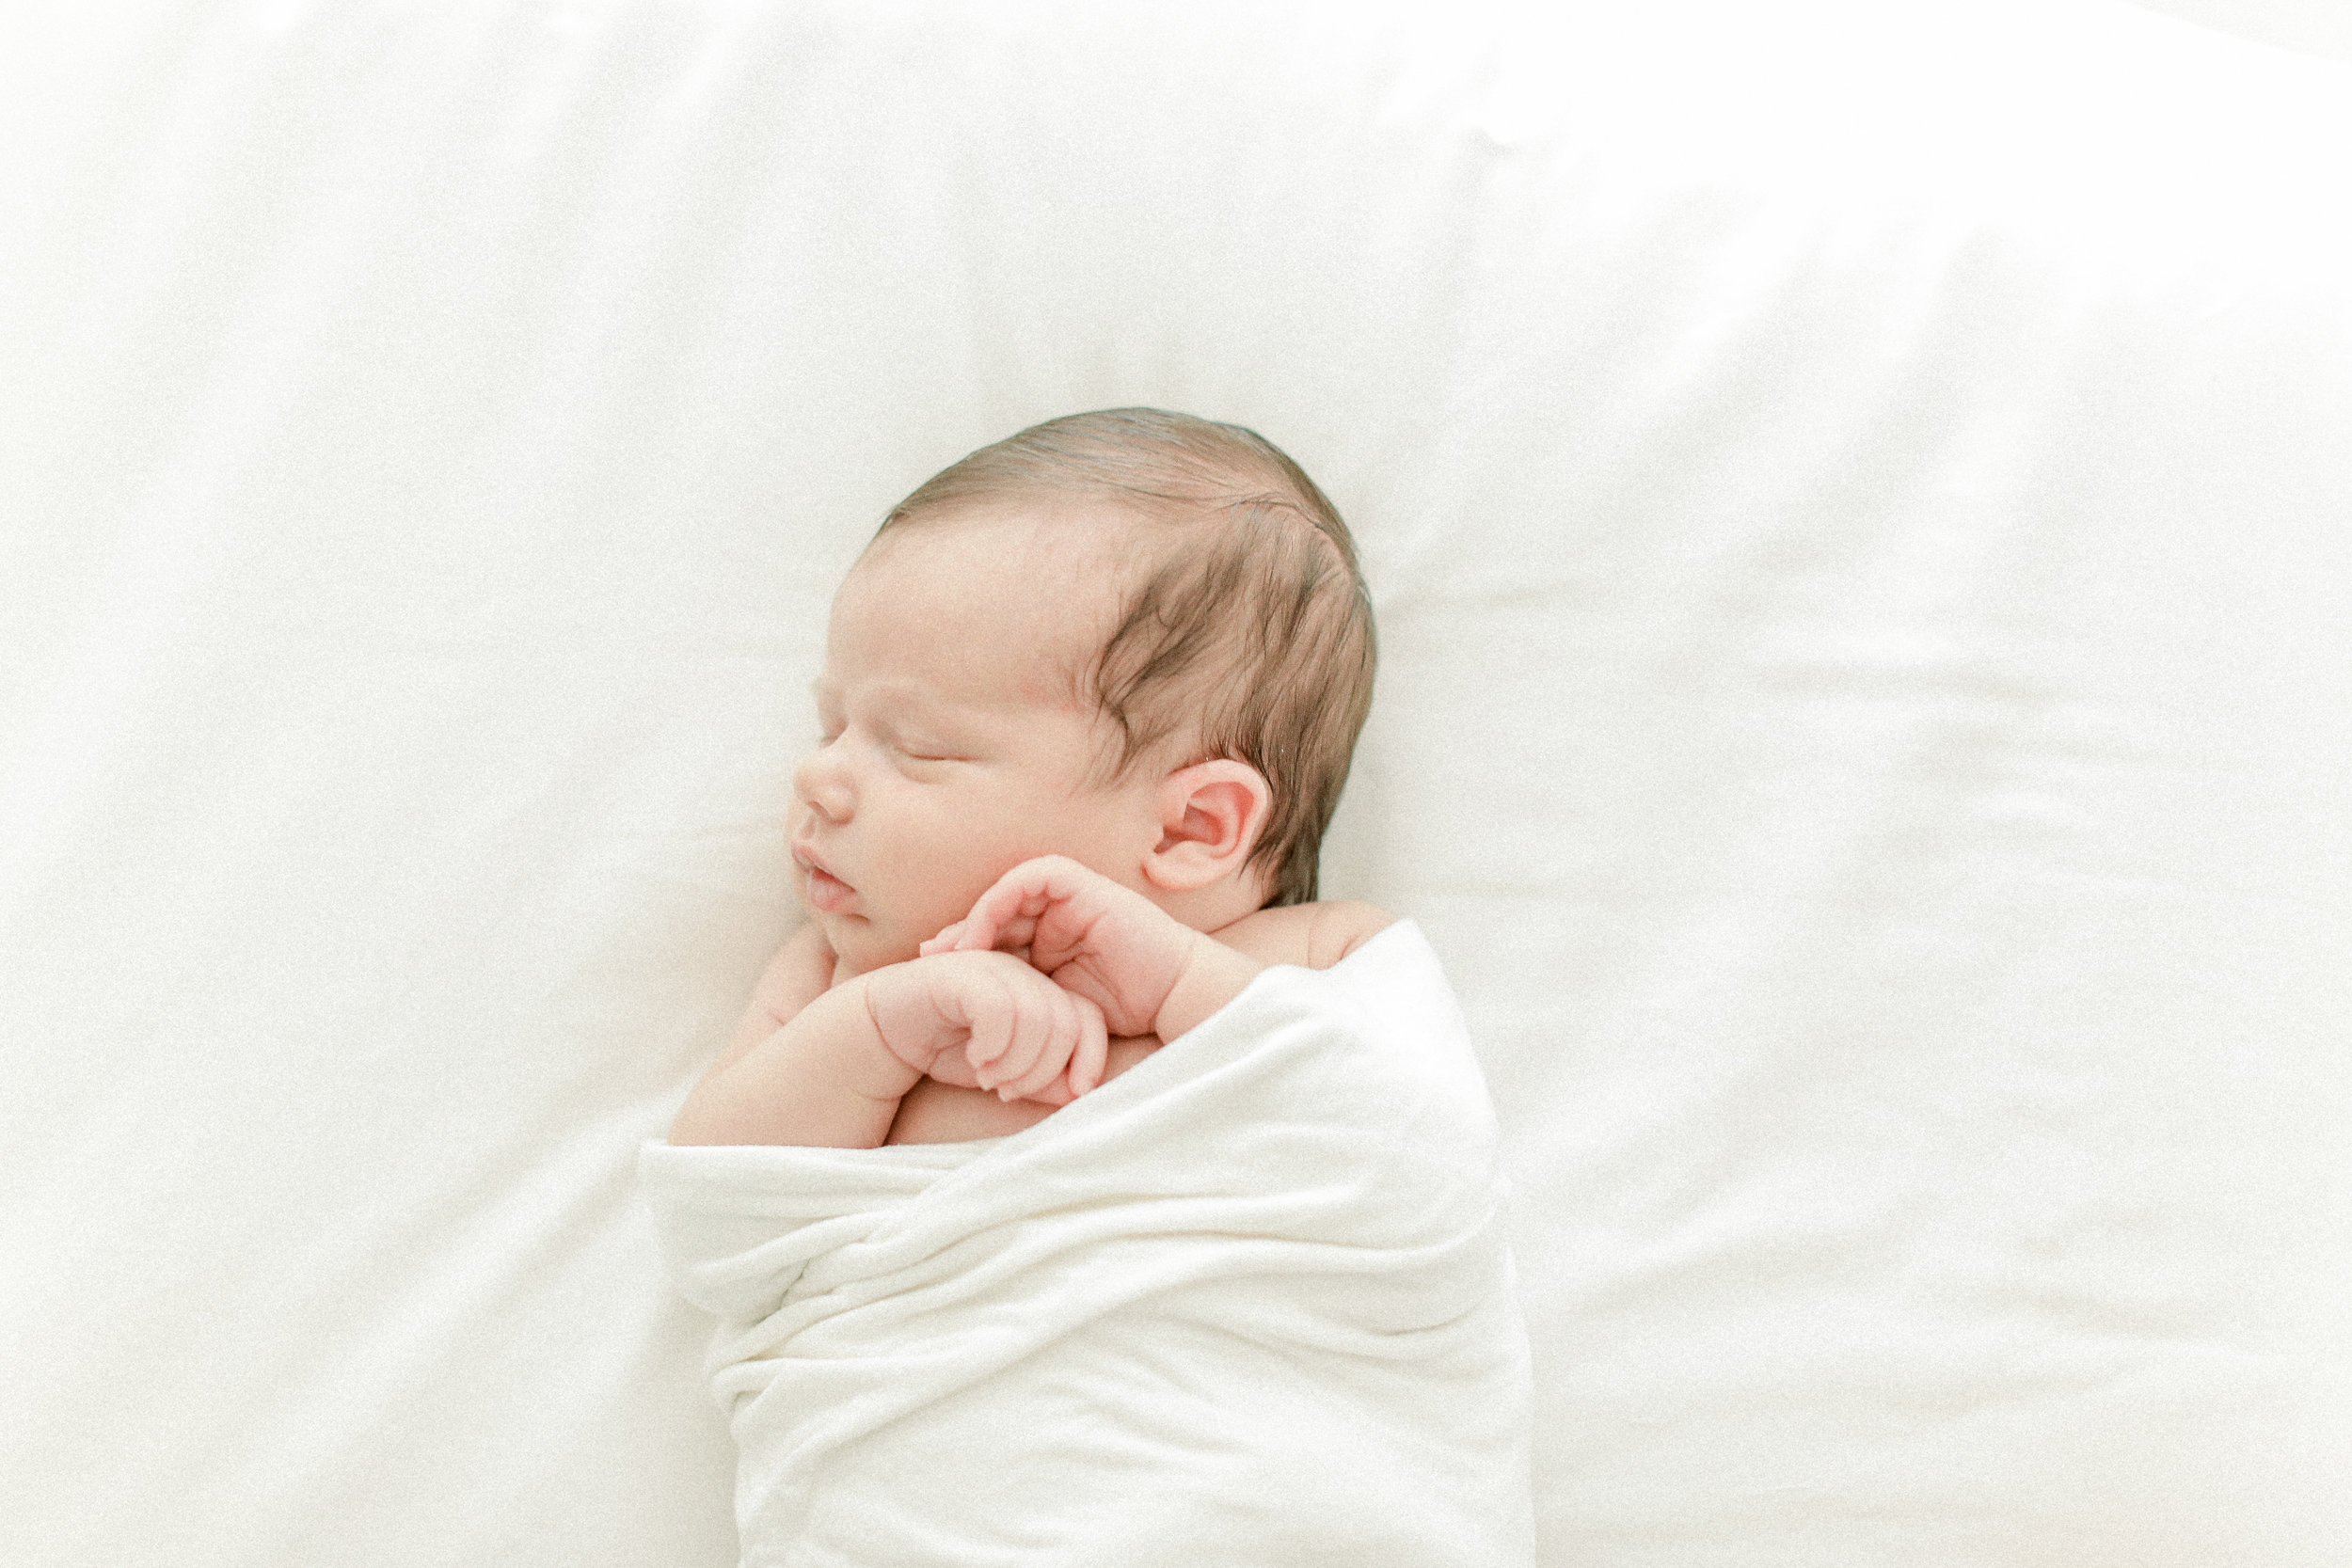 Cori-Kleckner-Photography- Santillo Family Session1-127.JPG